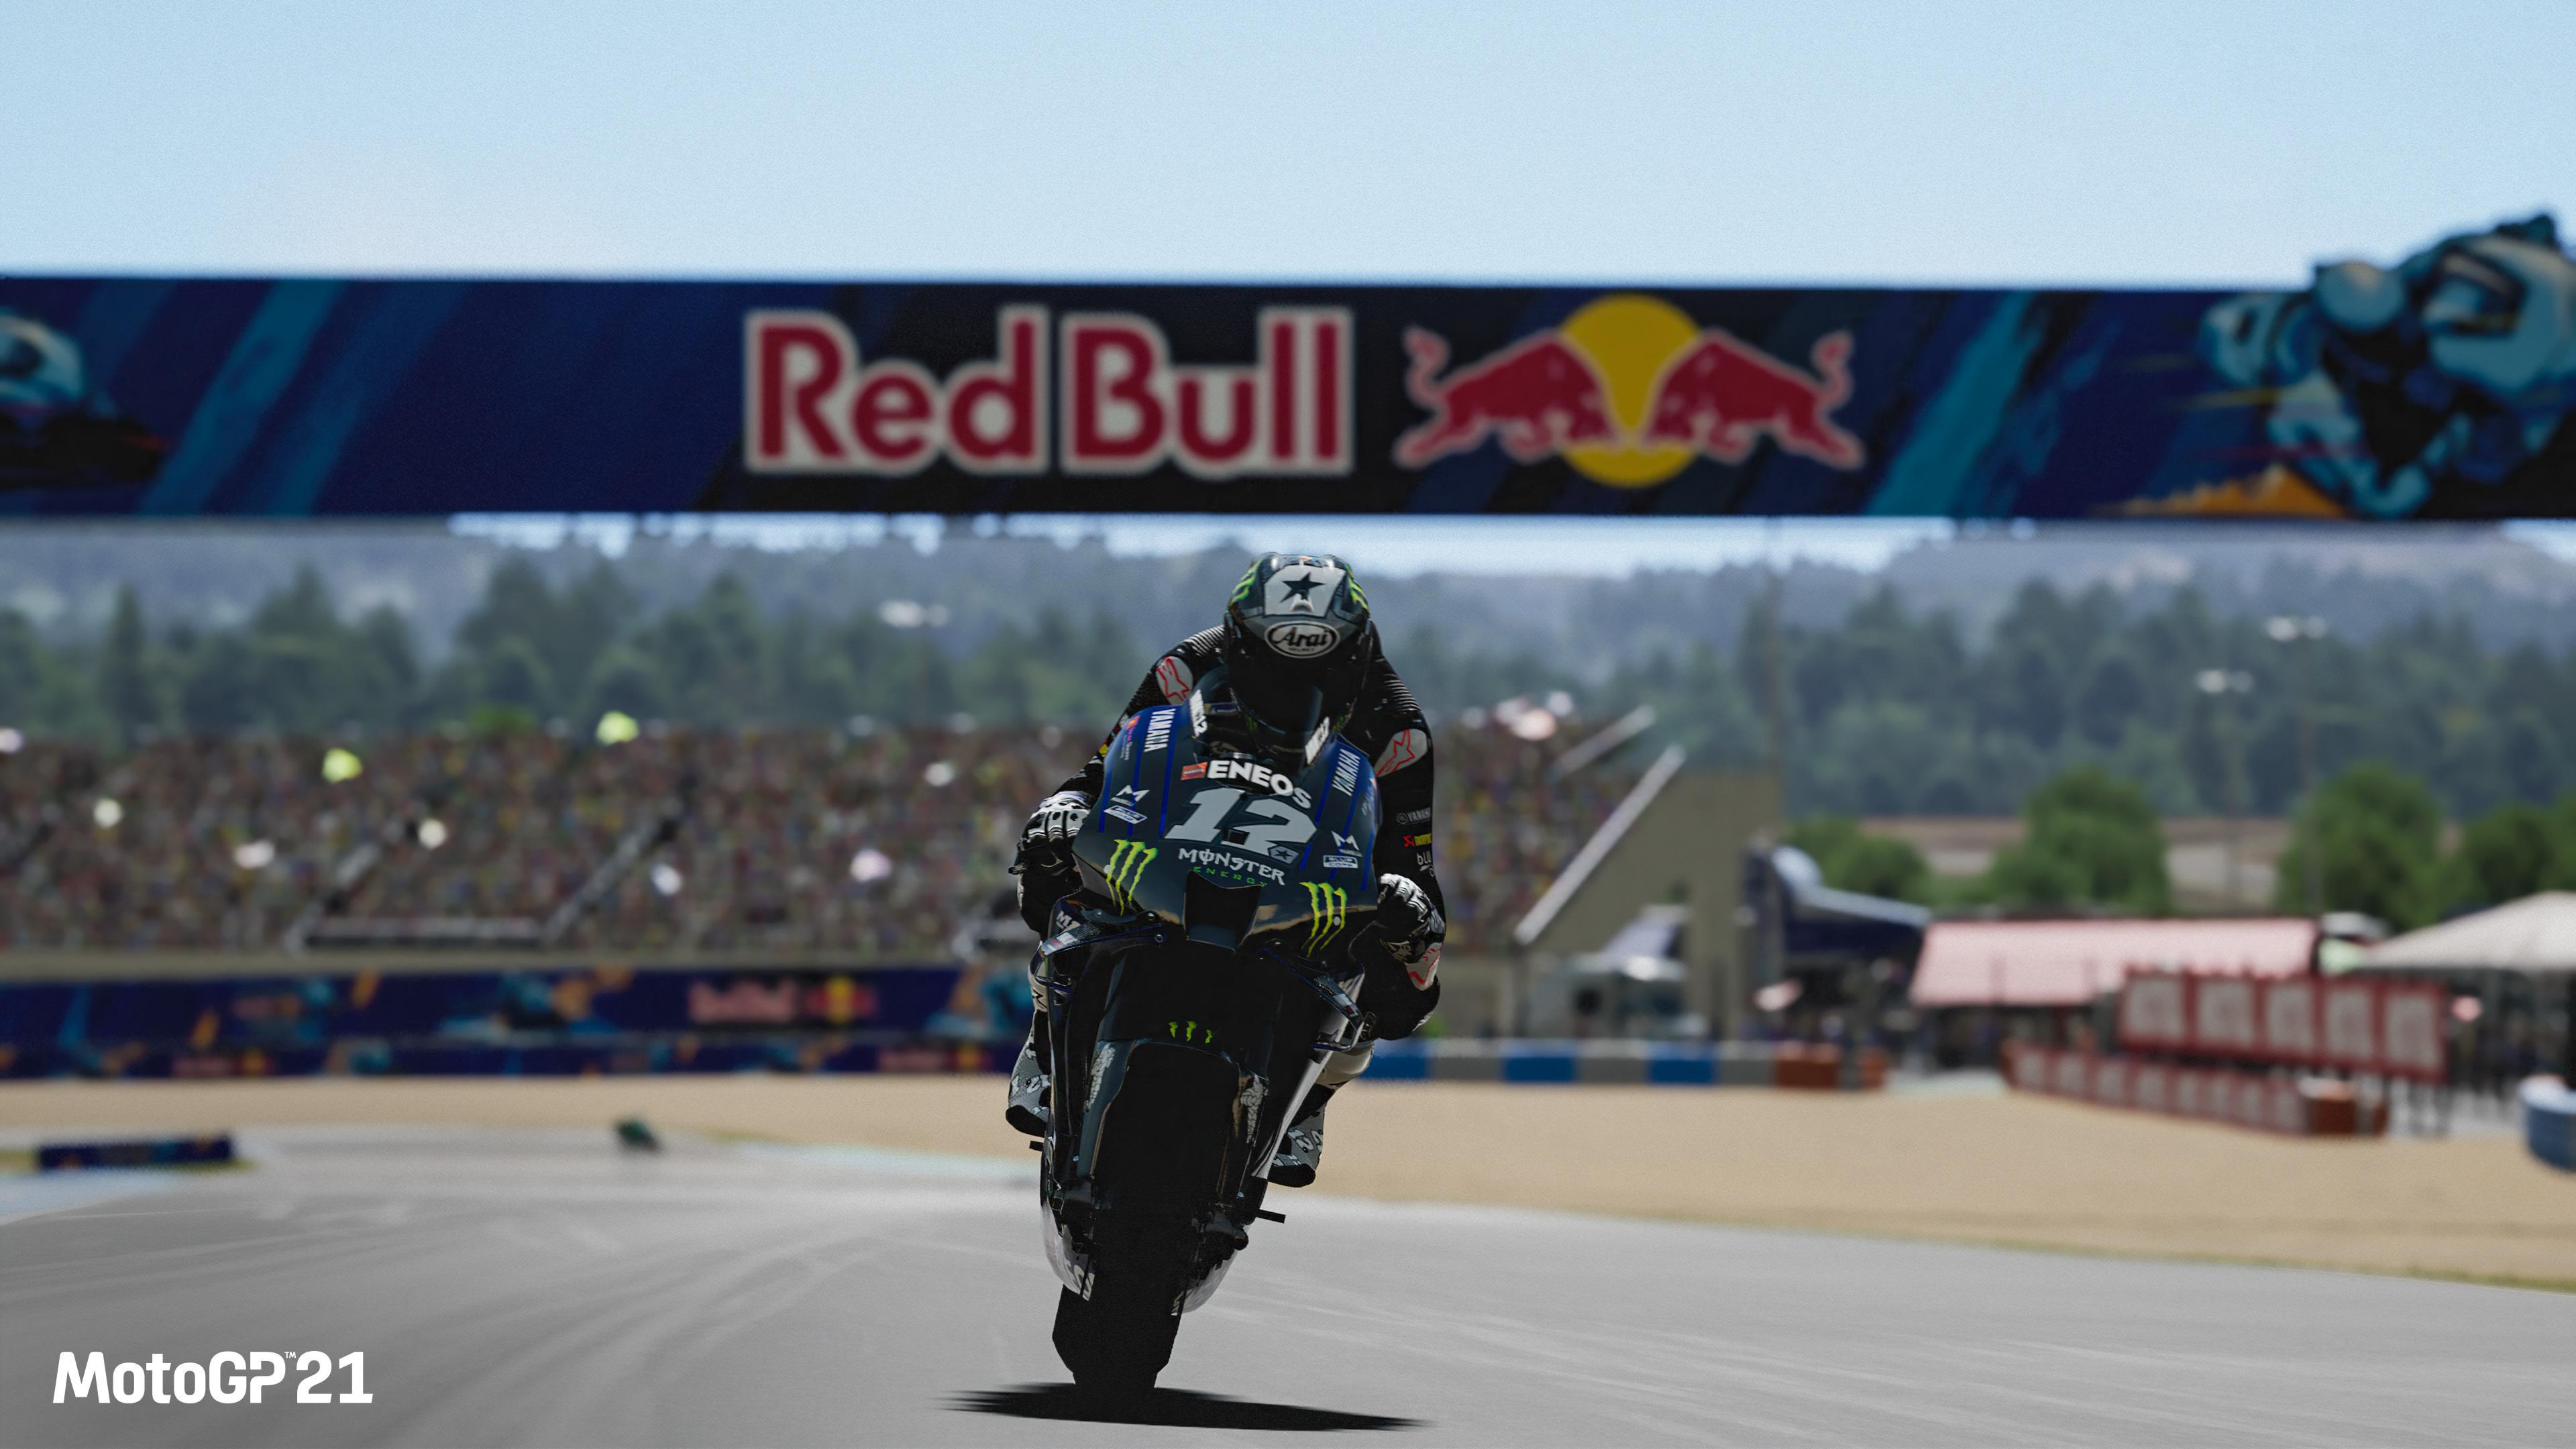 Video Game MotoGP 21 3840x2160